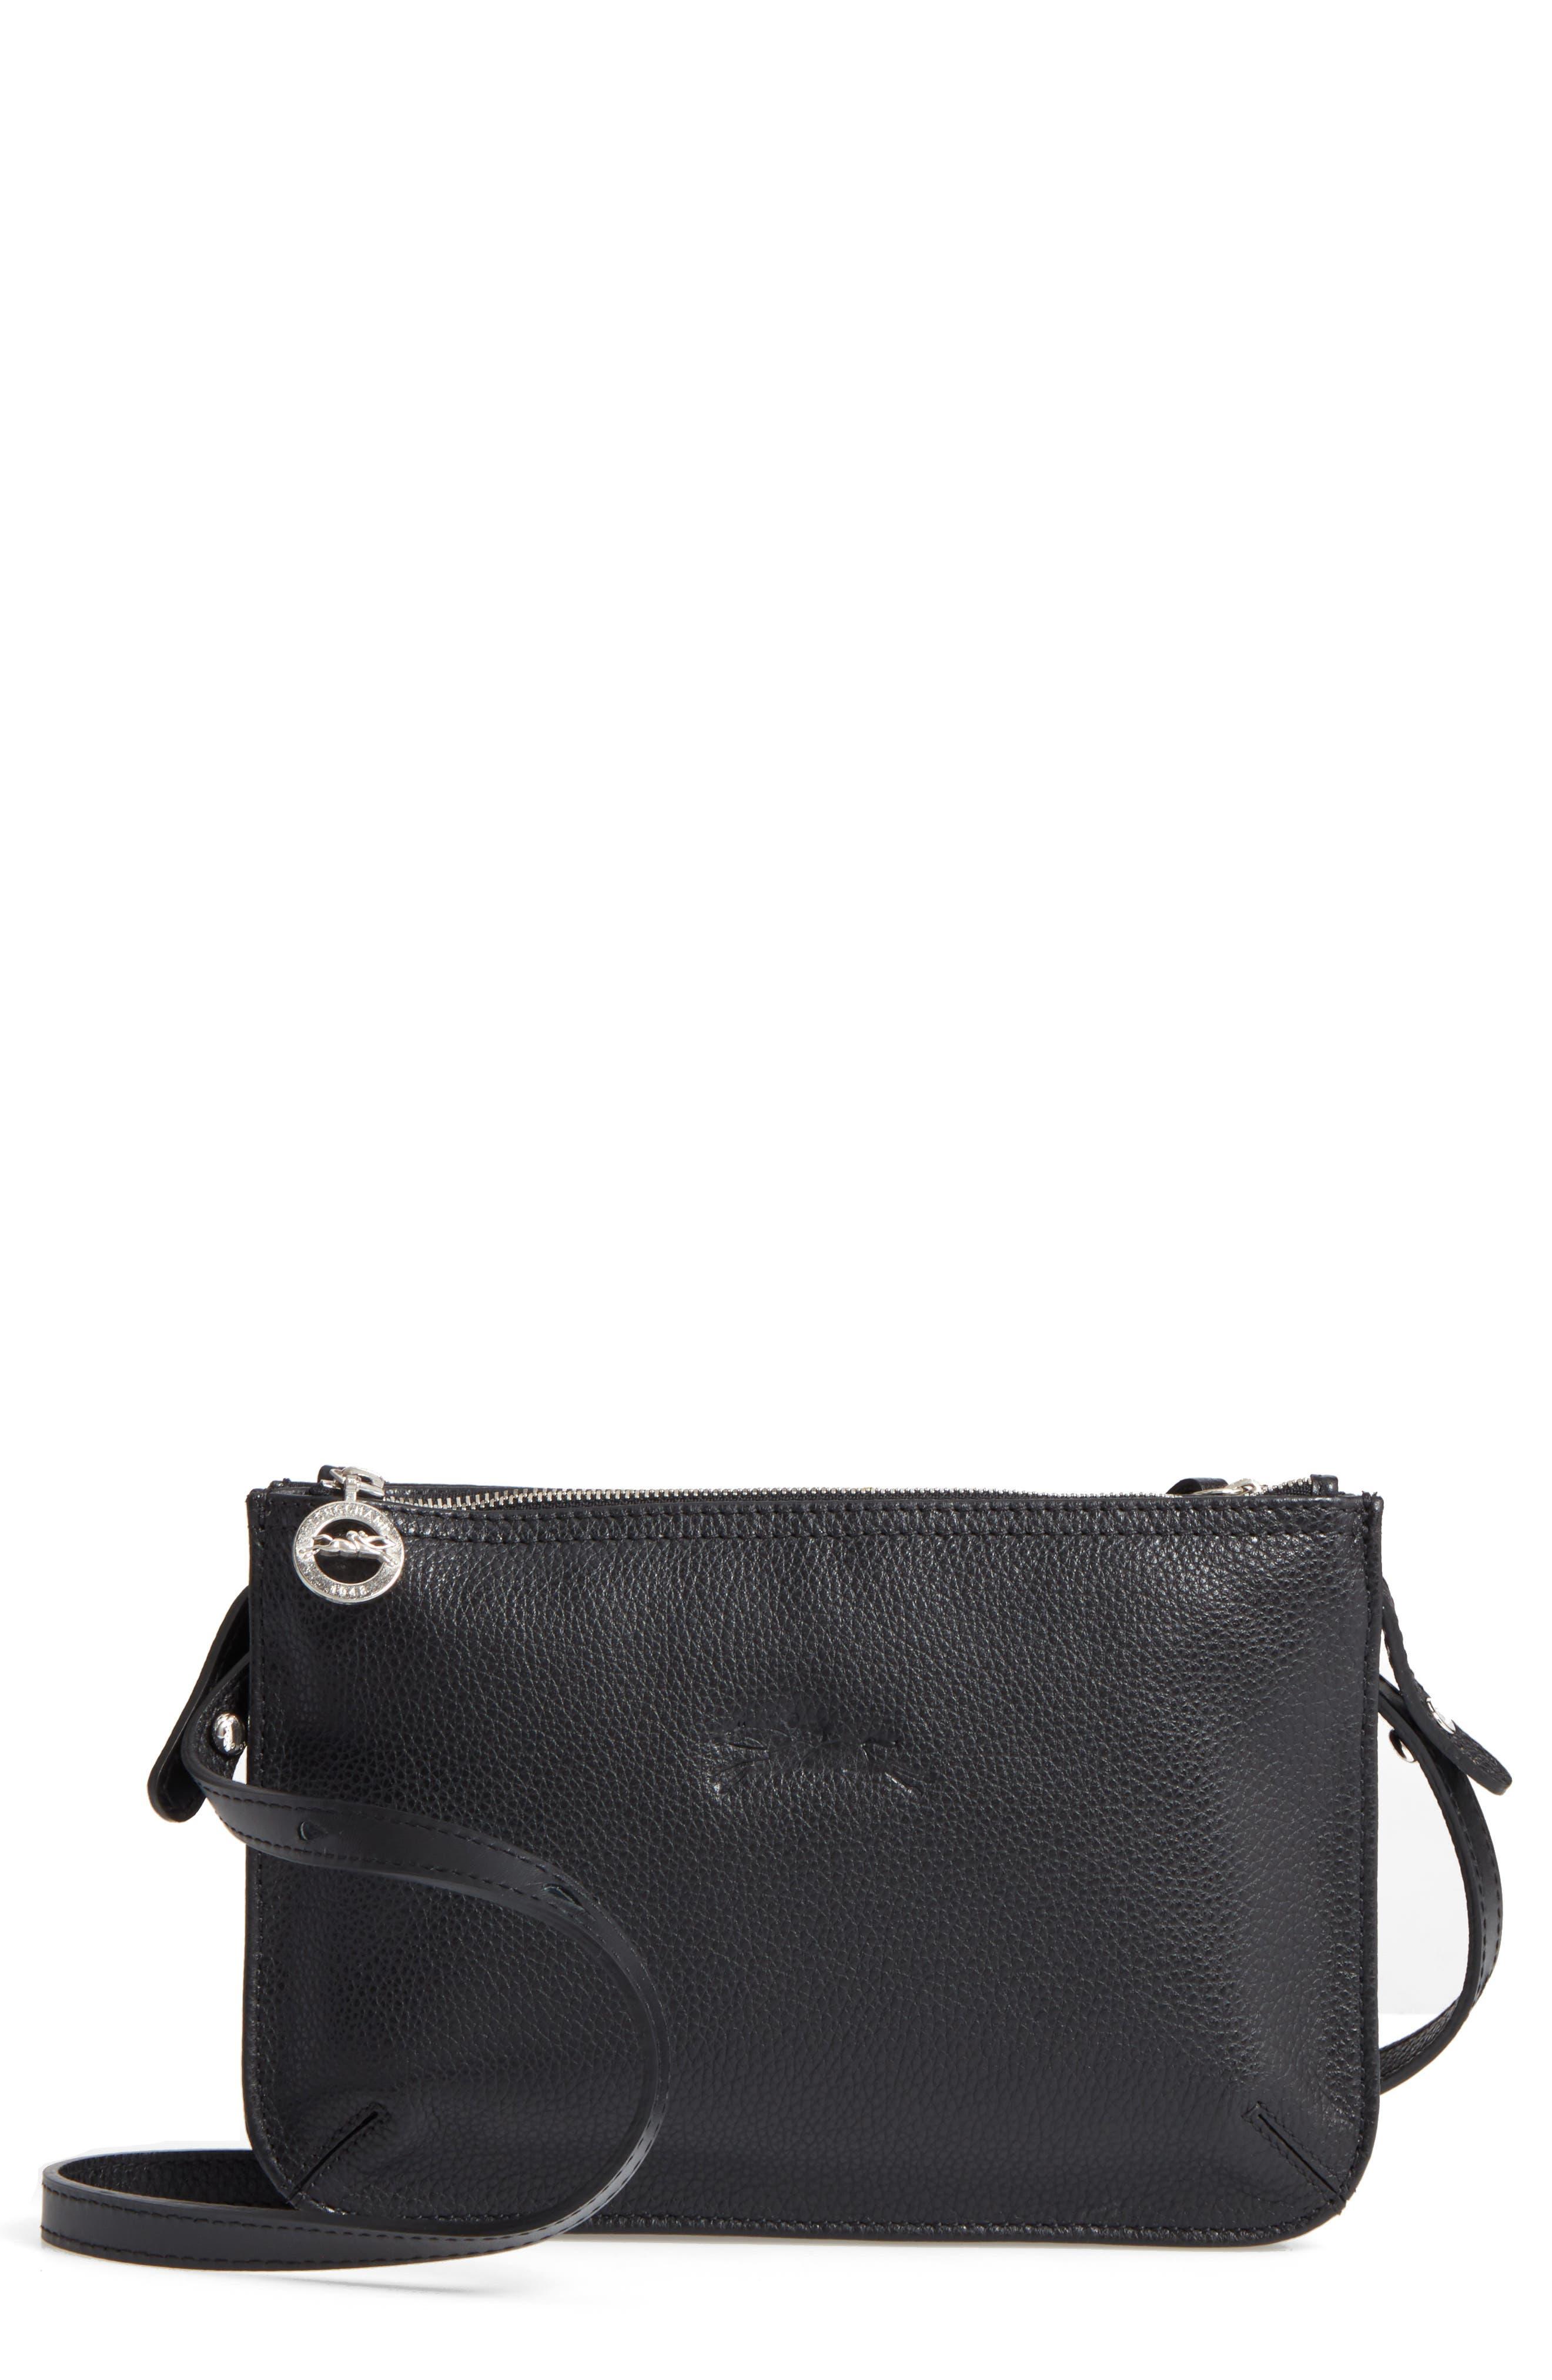 Main Image - Longchamp Le Foulonne Leather Crossbody Bag